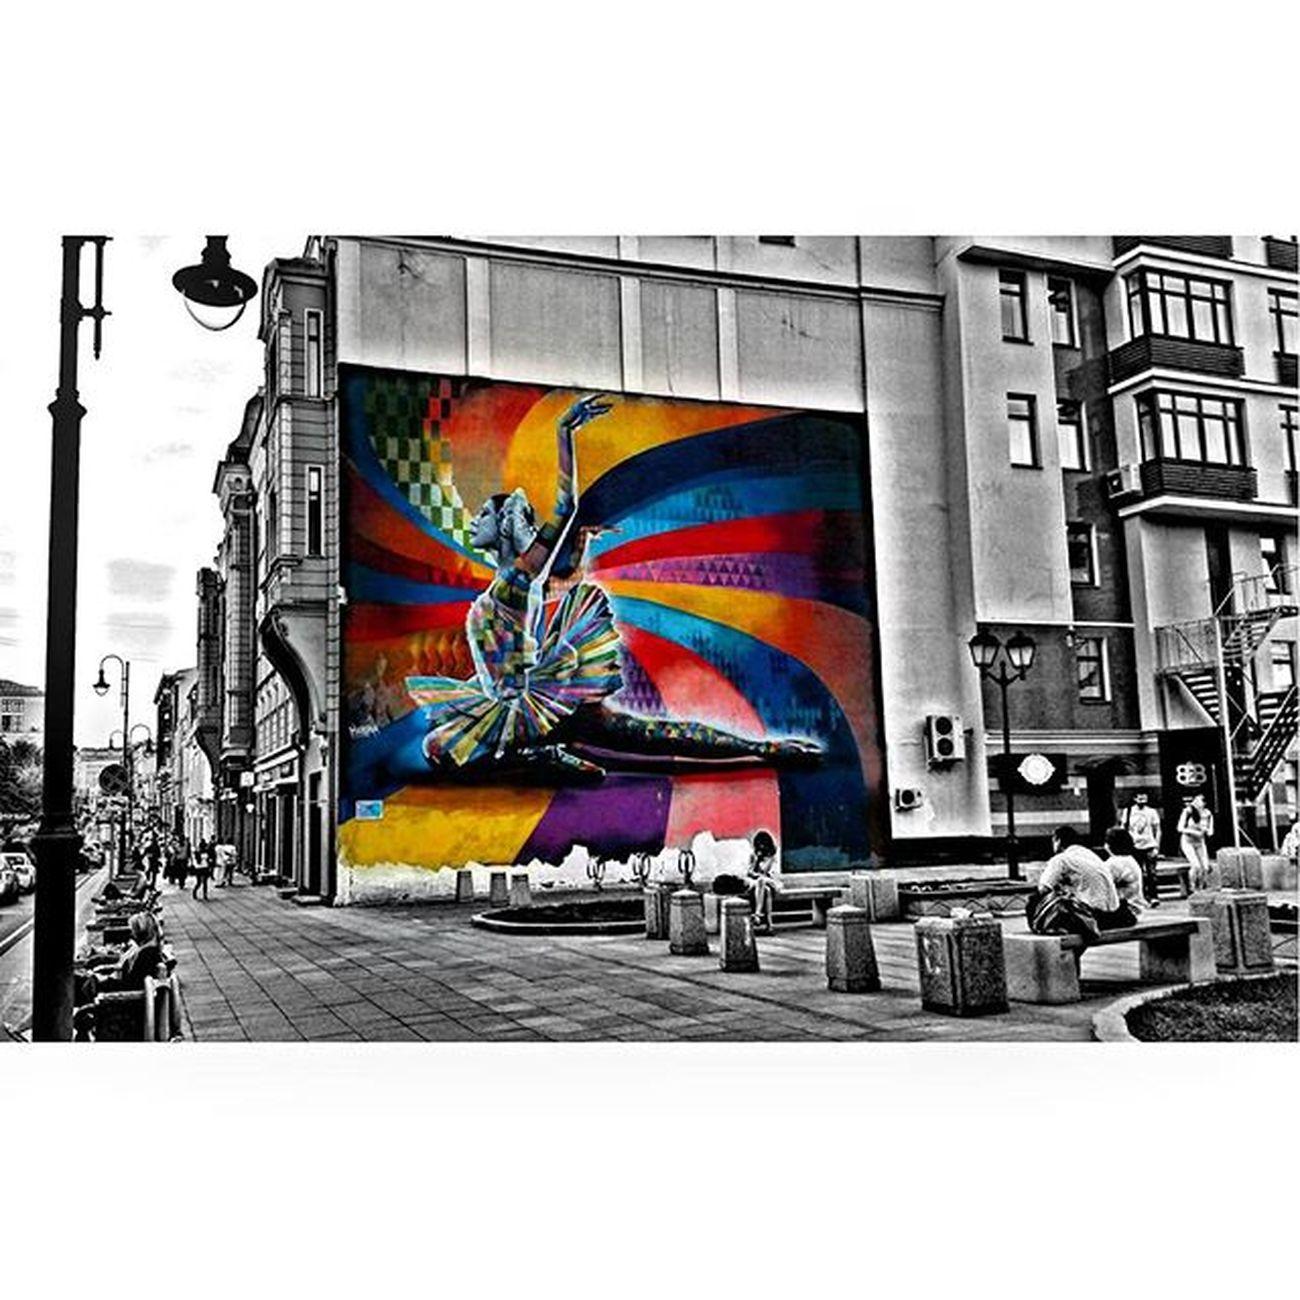 Ozkaningozunden Ozkgünlükleri Moscow Russia Москва мойгород твойгород Turkey Ig_mood GalaxyNoteEdge улицабольшаяпокровская Nxgramers ...